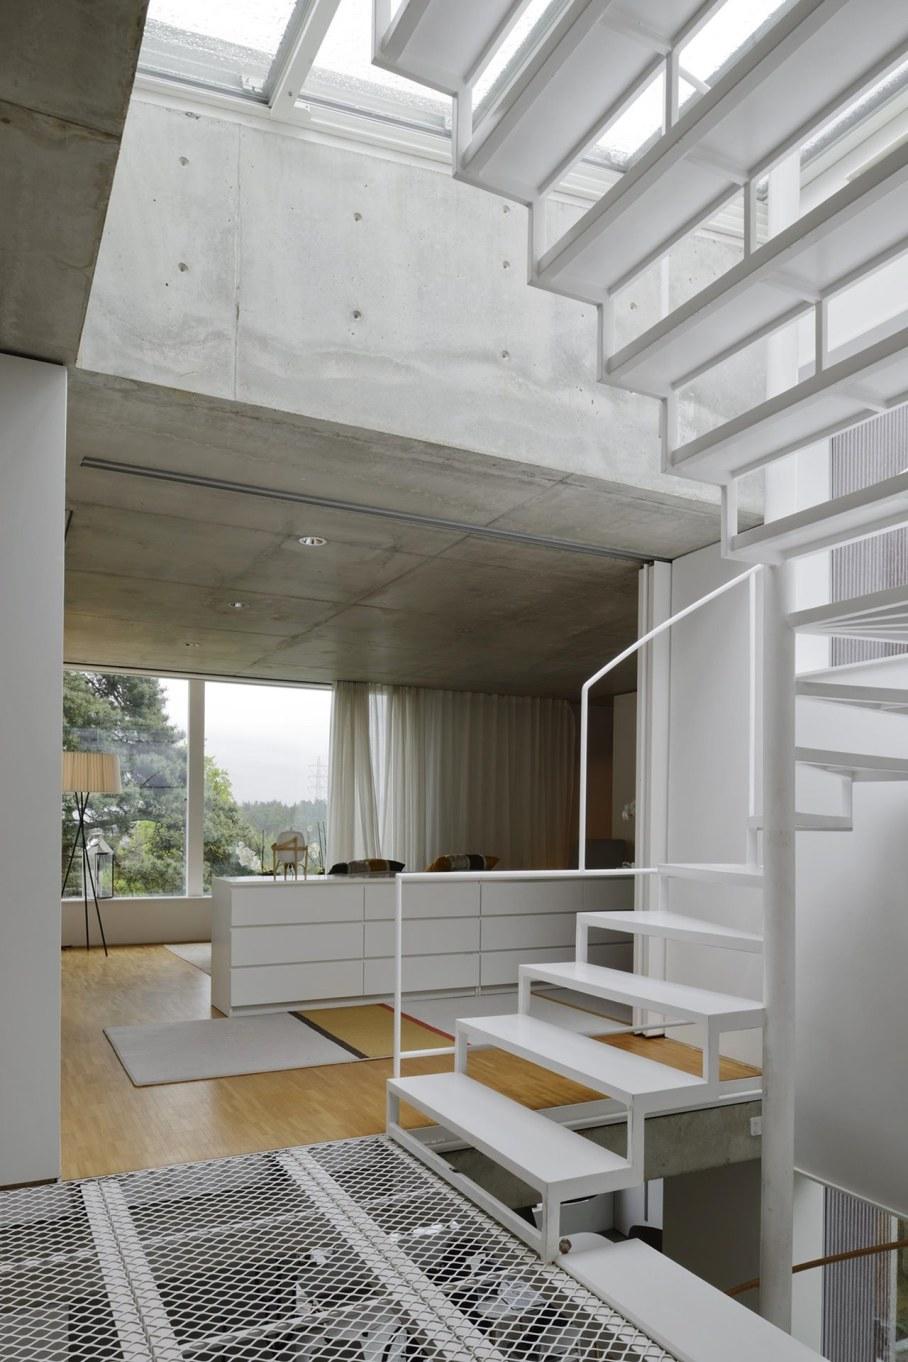 The villa Altona in ambience of untouched nature - Design ideas